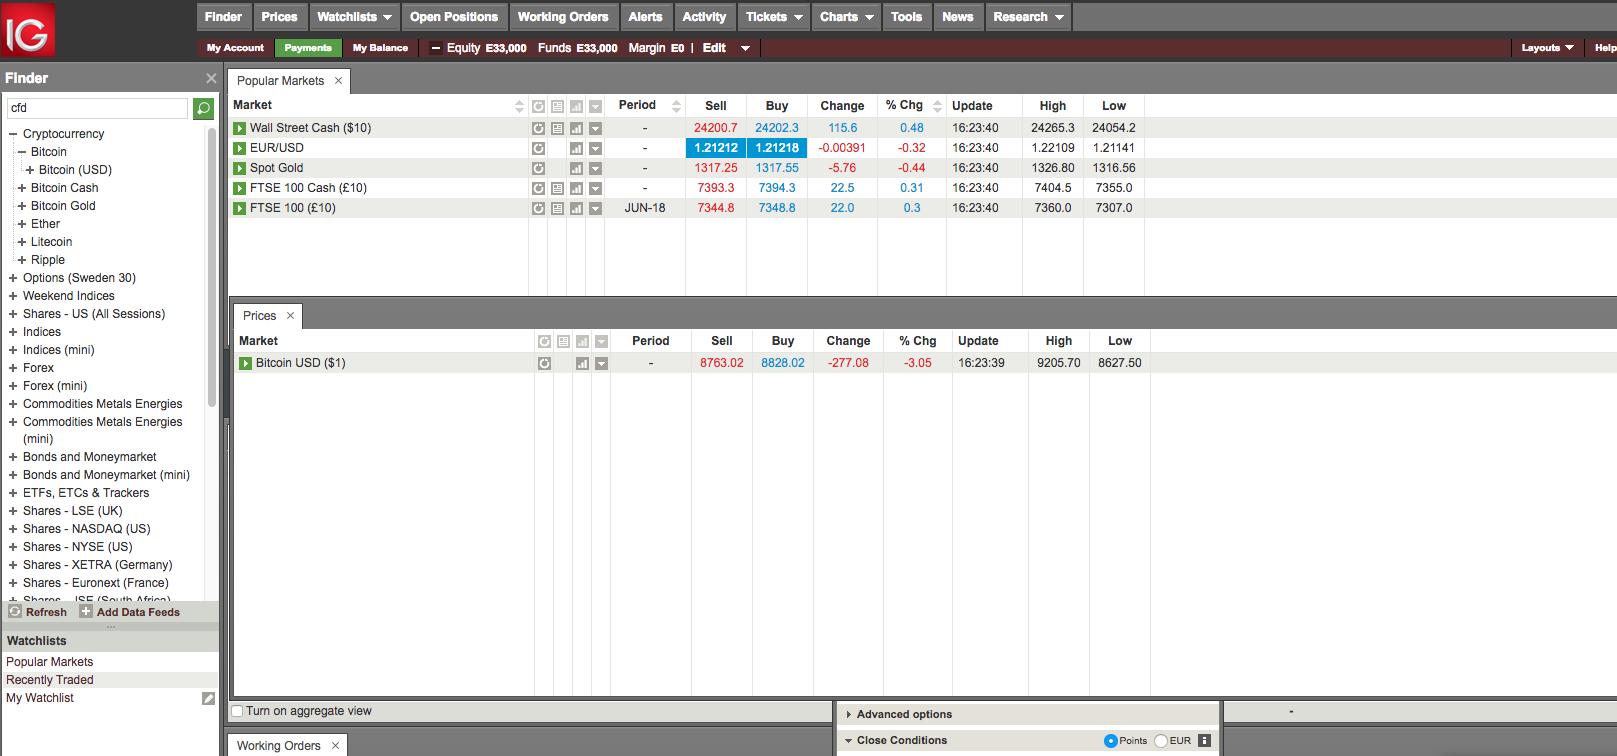 ESMA-CFD-intervention-new-regulation-blogpost-IG-web-trading-platform